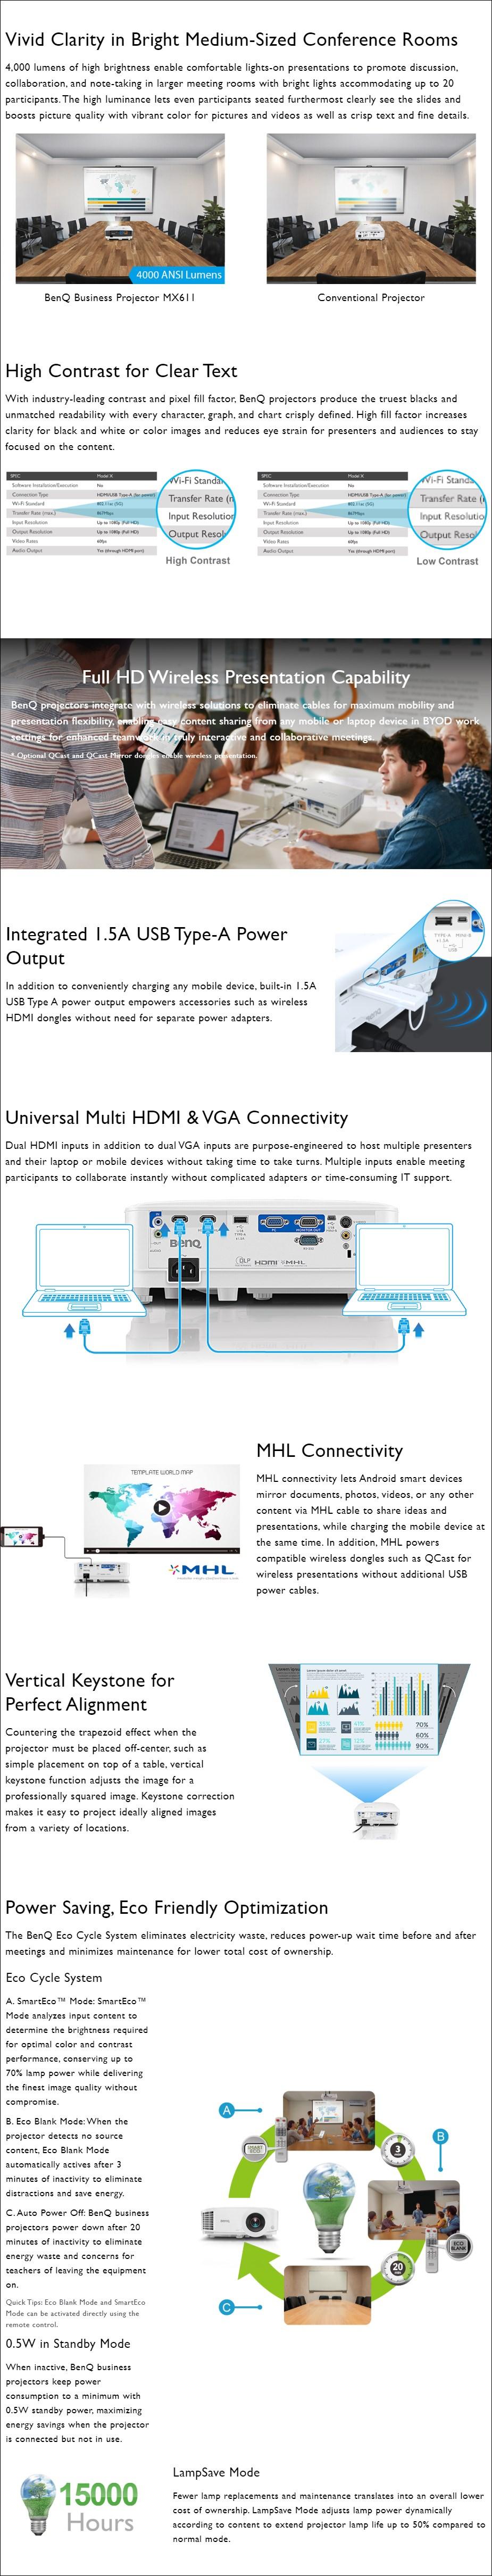 BenQ MX611 XCGA Wireless Meeting Room Business Projector - Overview 1